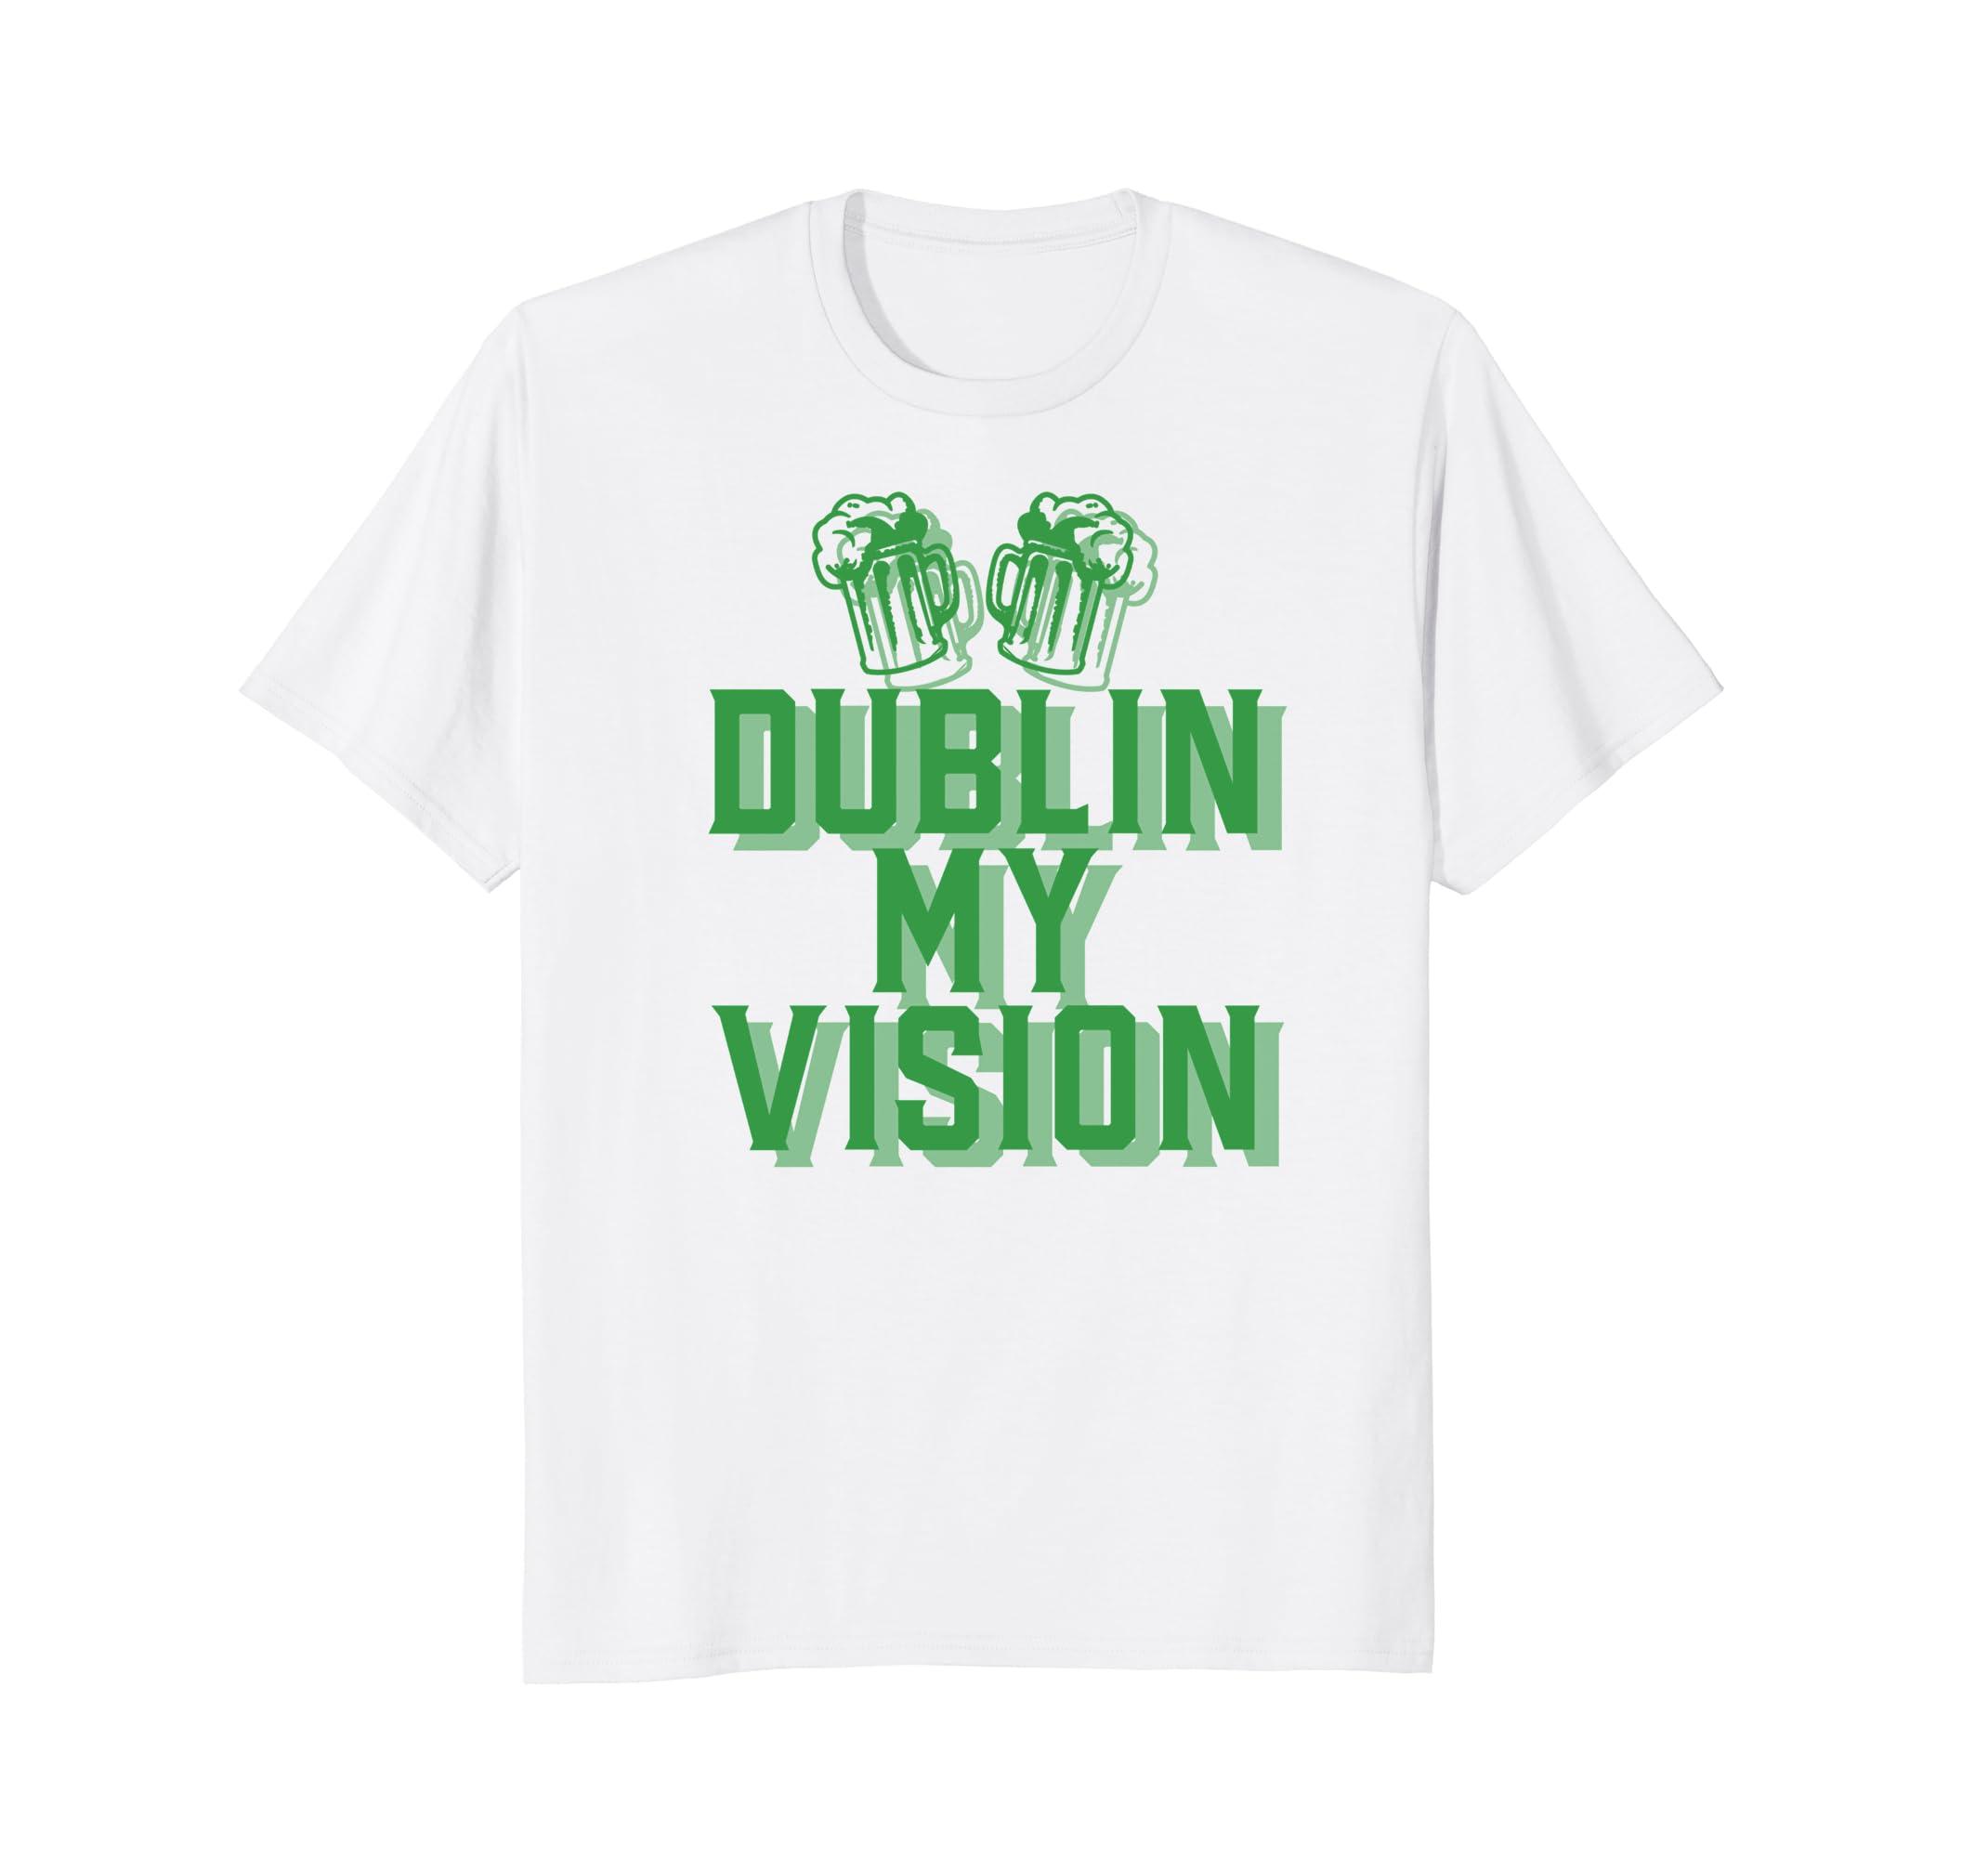 8d6ec11d St Patricks Day Shirts Funny Amazon